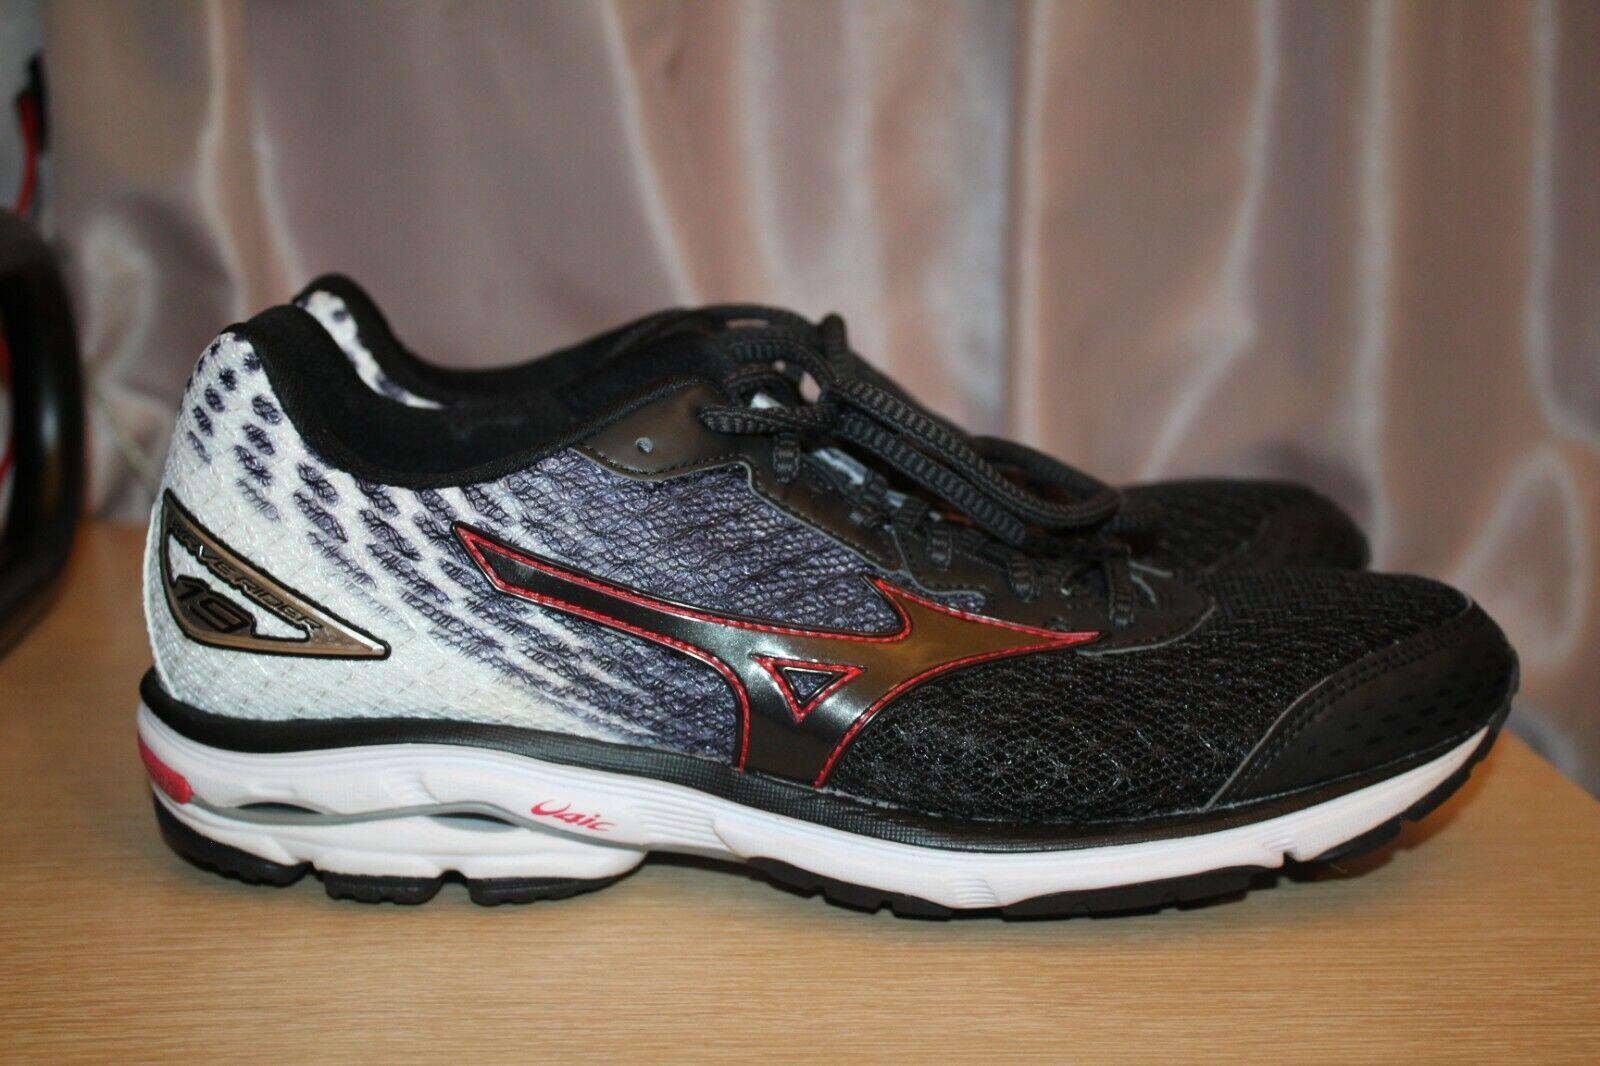 mizuno mens running shoes size 9 youth gold usa basketball